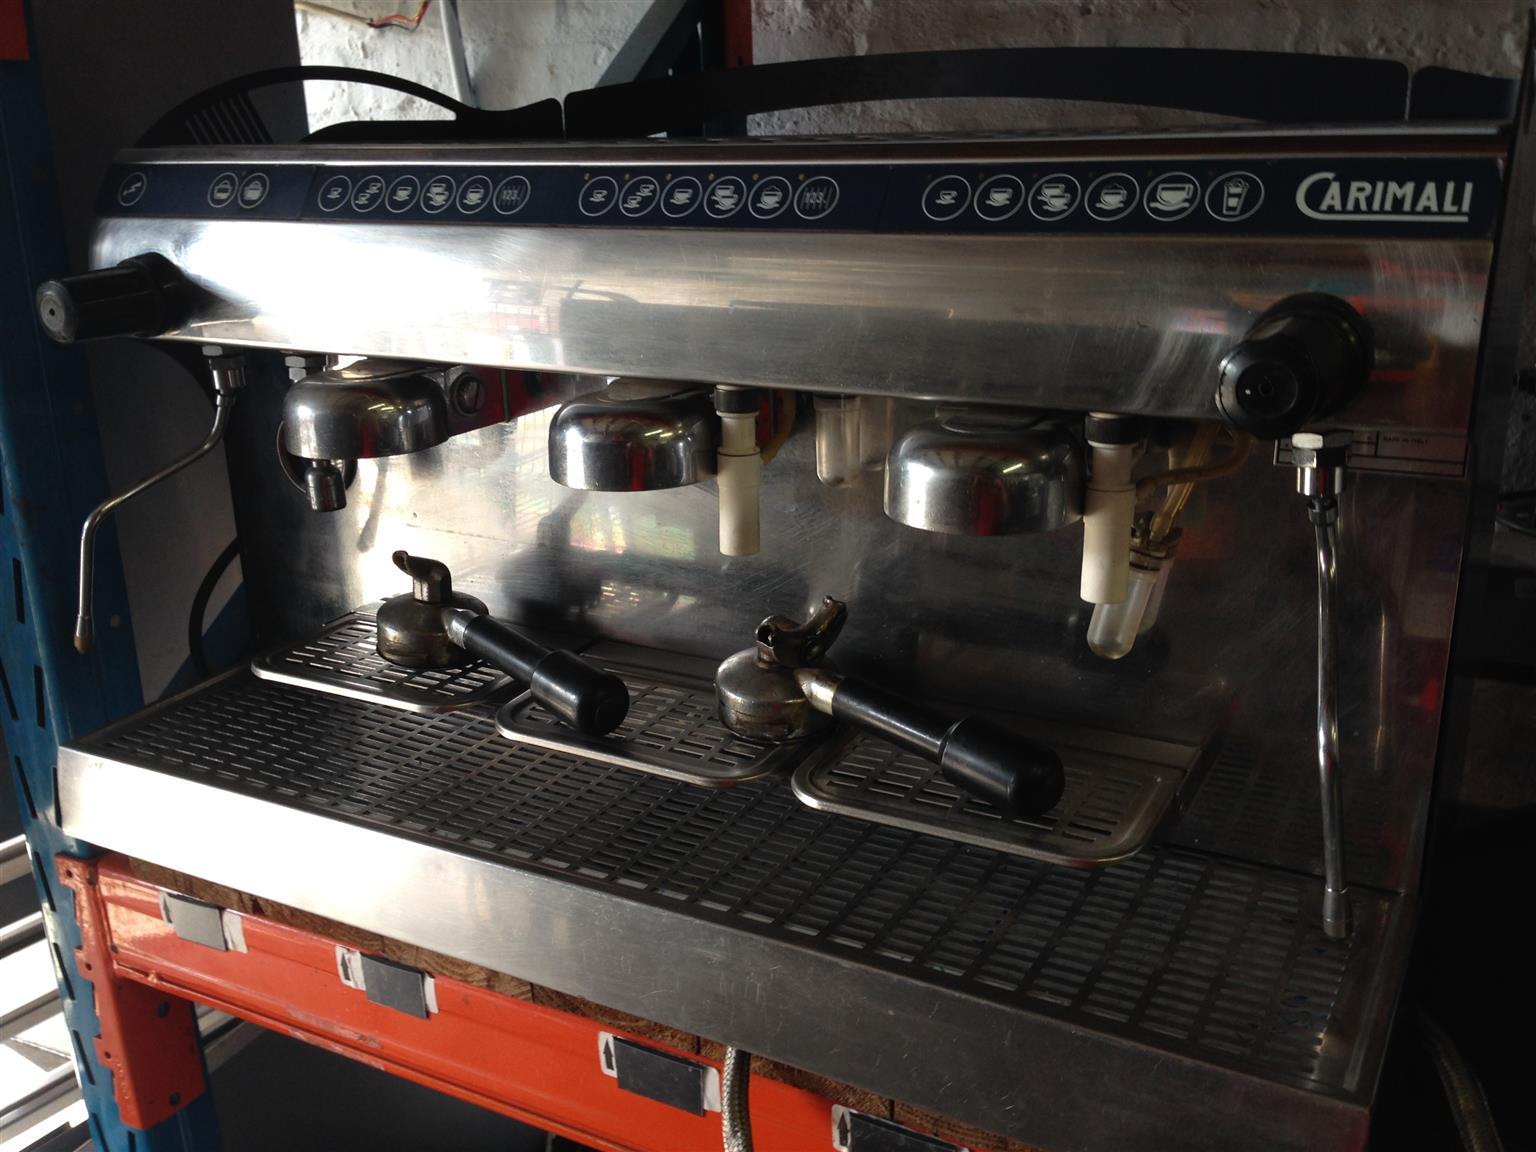 Carimali coffee machine